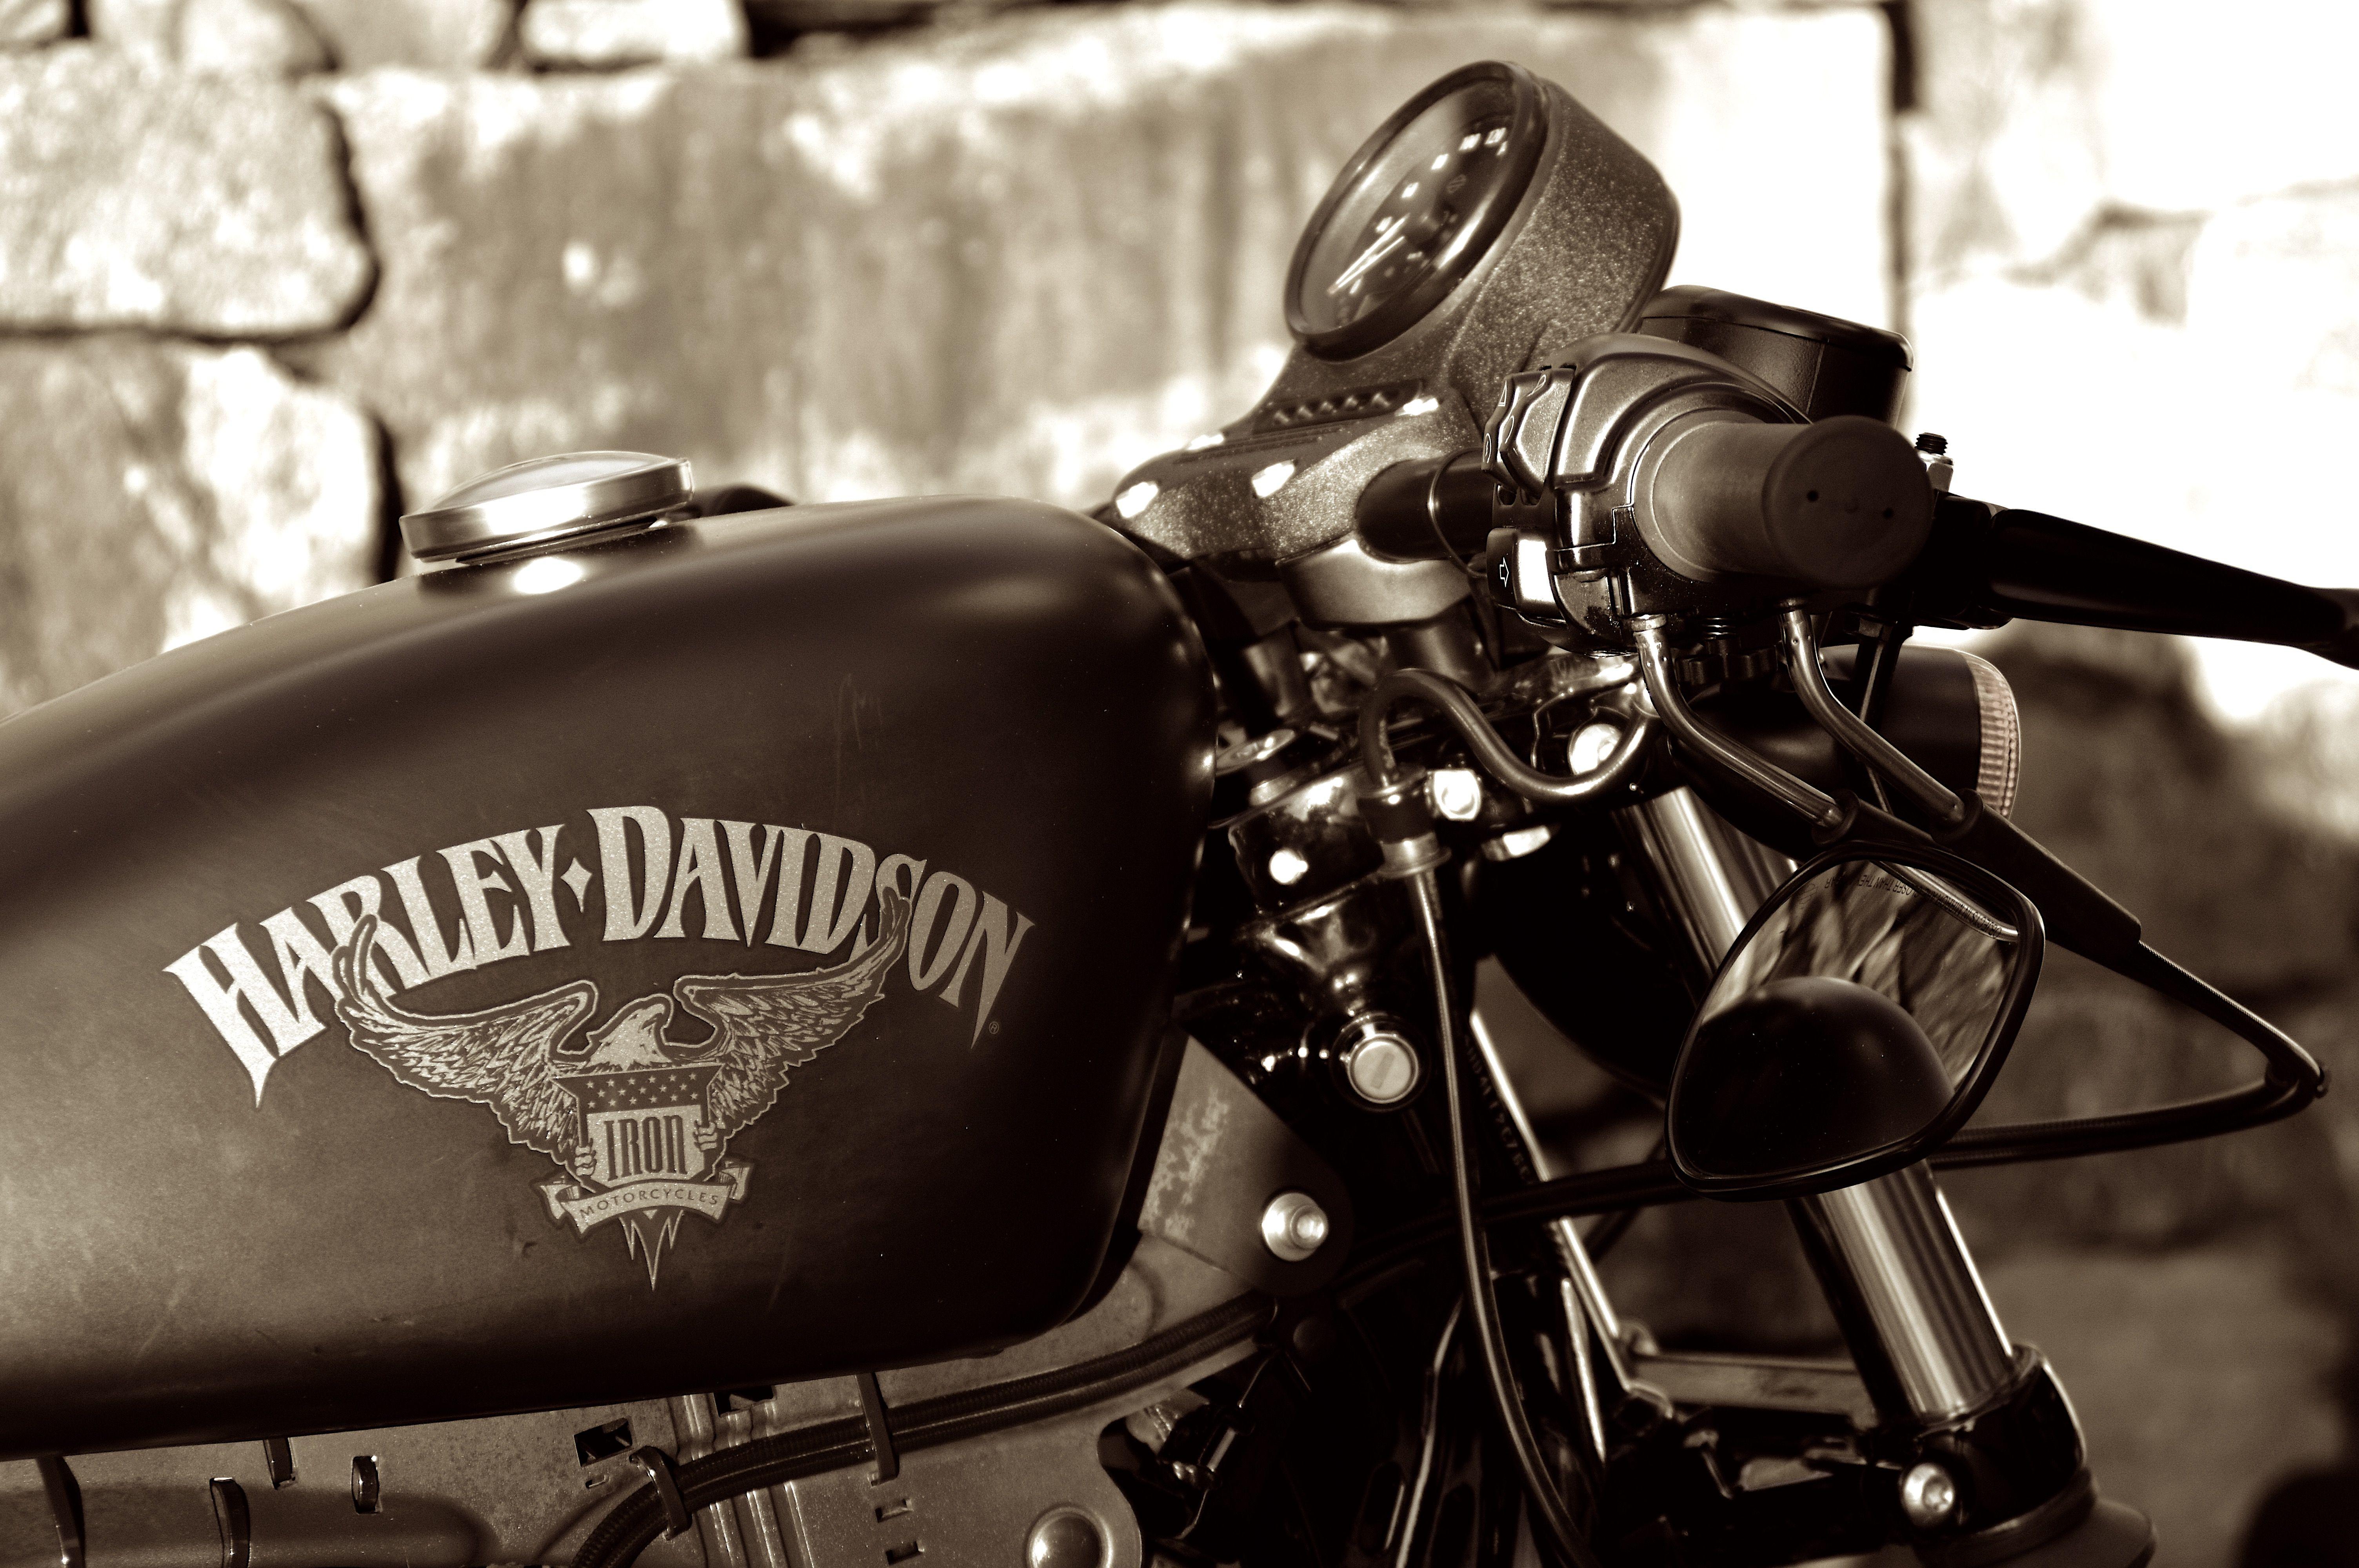 Iron 883 Harley davidson, Iron 883, Harley